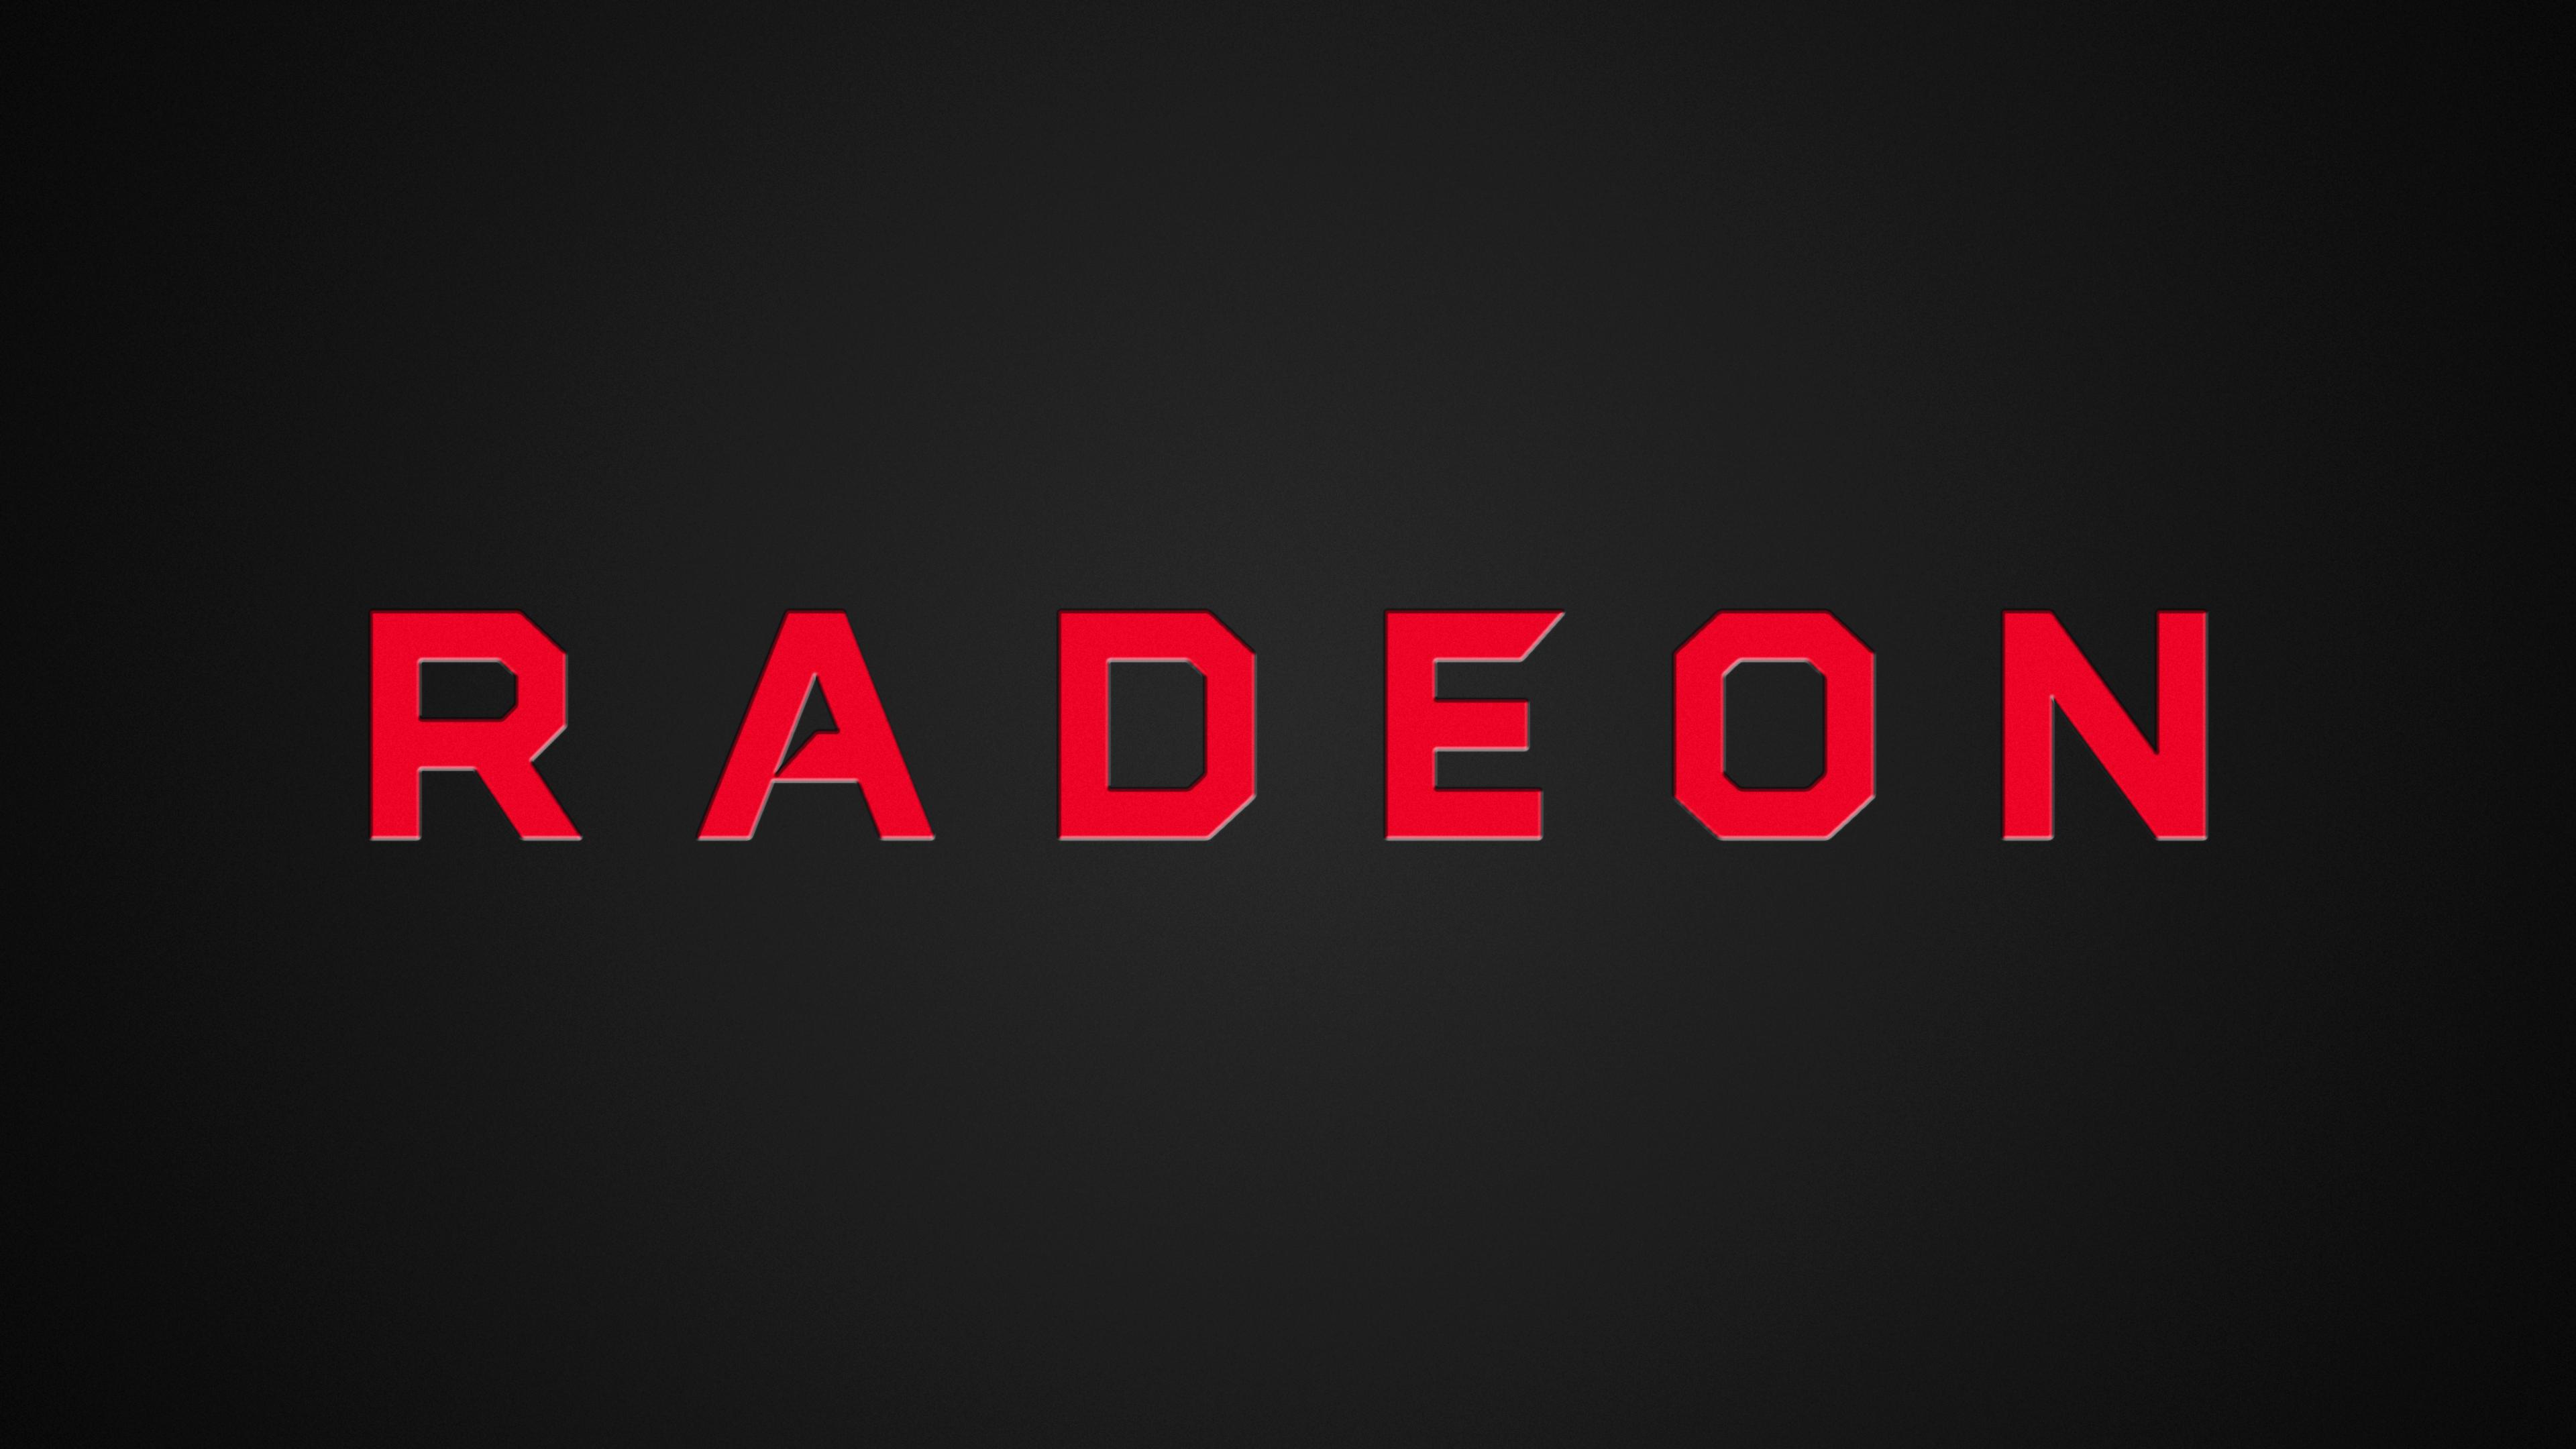 New Radeon Logo 4K Wallpaper